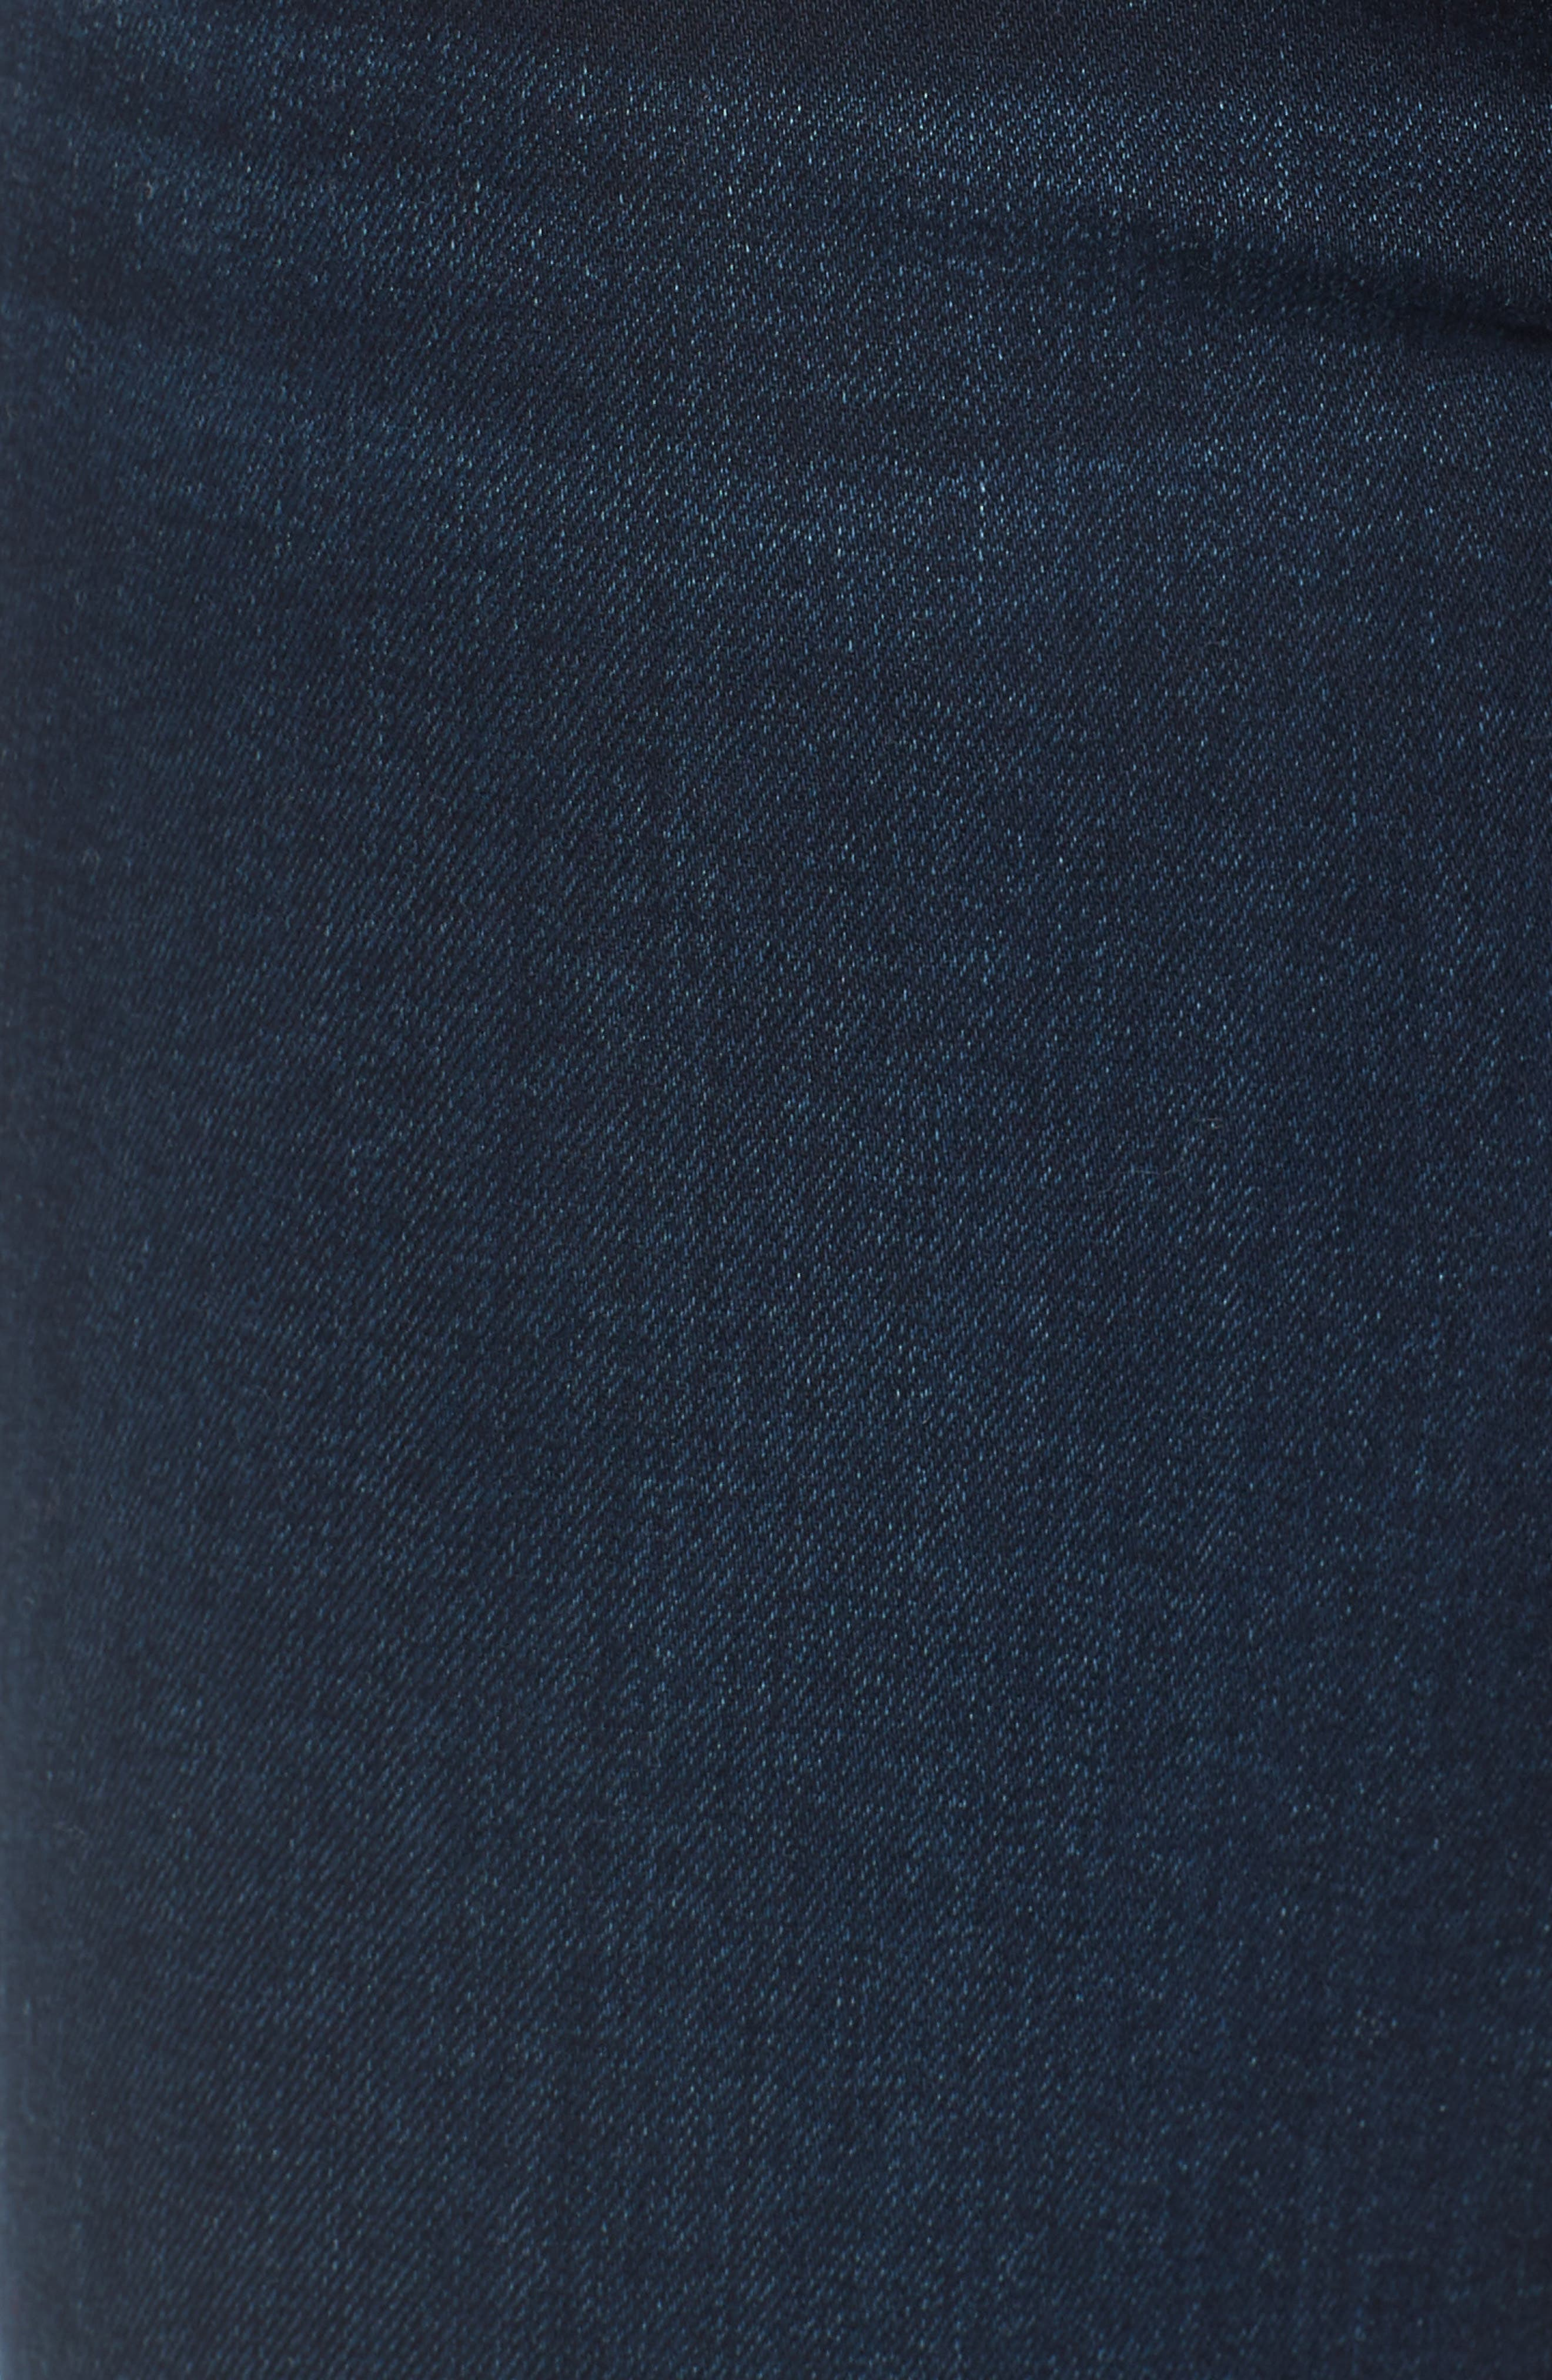 JEN7 BY 7 FOR ALL MANKIND, Comfort Skinny Denim Leggings, Alternate thumbnail 6, color, RICHE TOUCH BLUE/BLACK